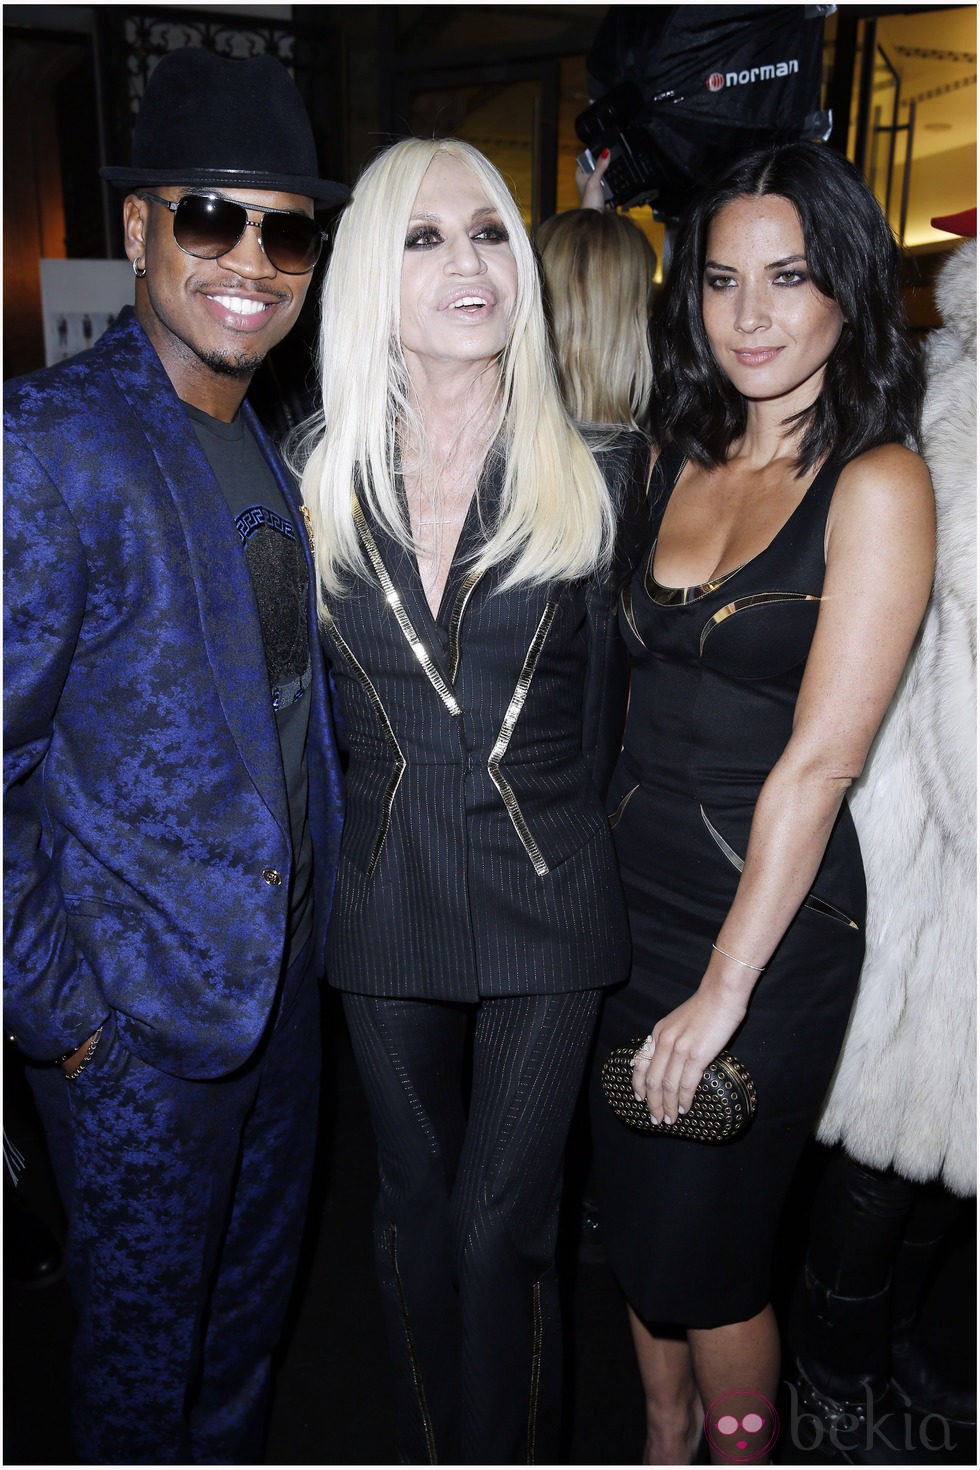 Ne-Yo, Donatella Versace y Olivia Munn en la Semana de la Moda de París otoño/invierno 2013/2014